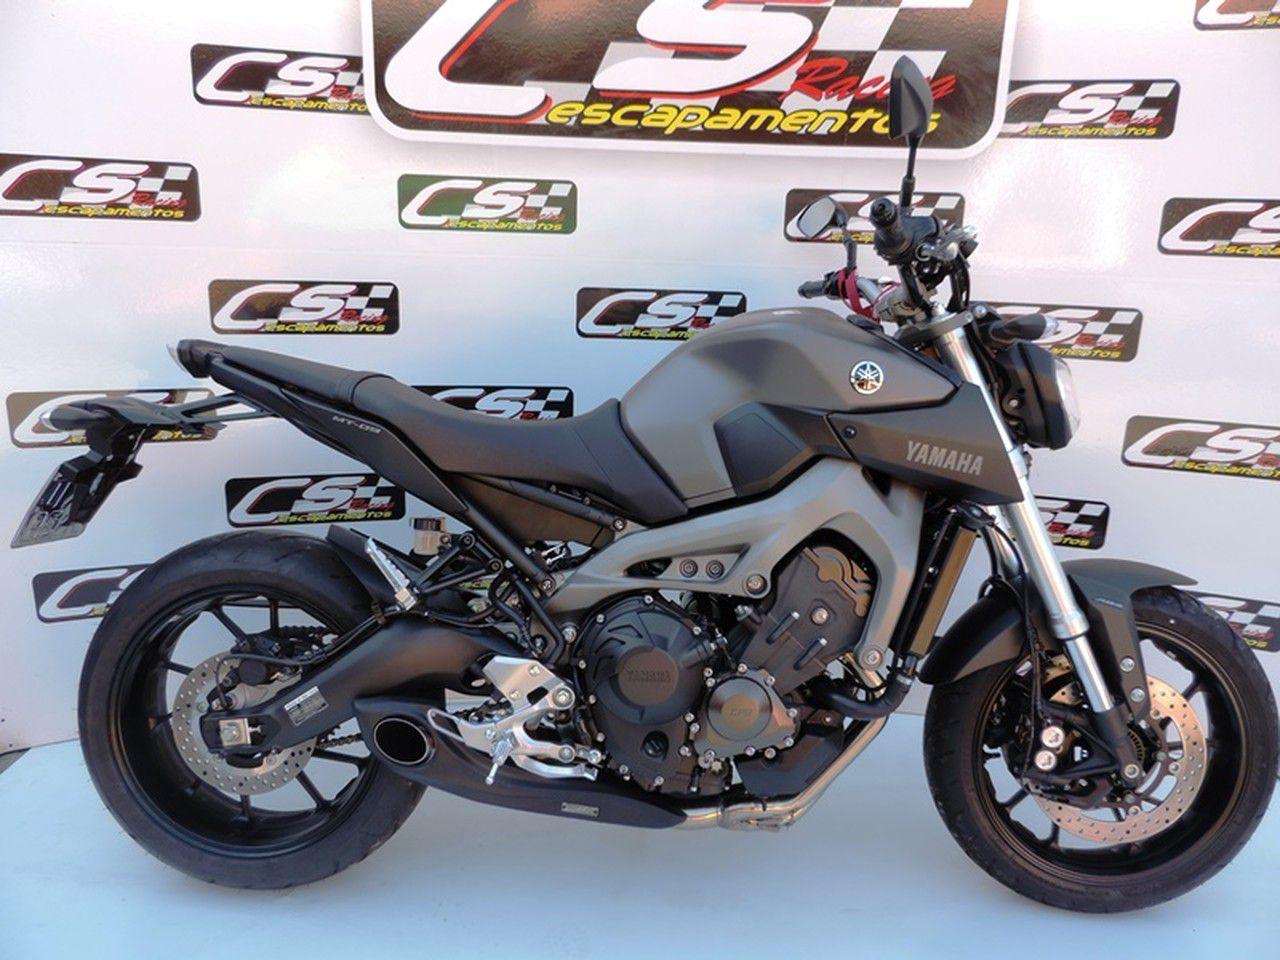 Escapamento Esportivo Full   CS Racing   Yamaha MT-09